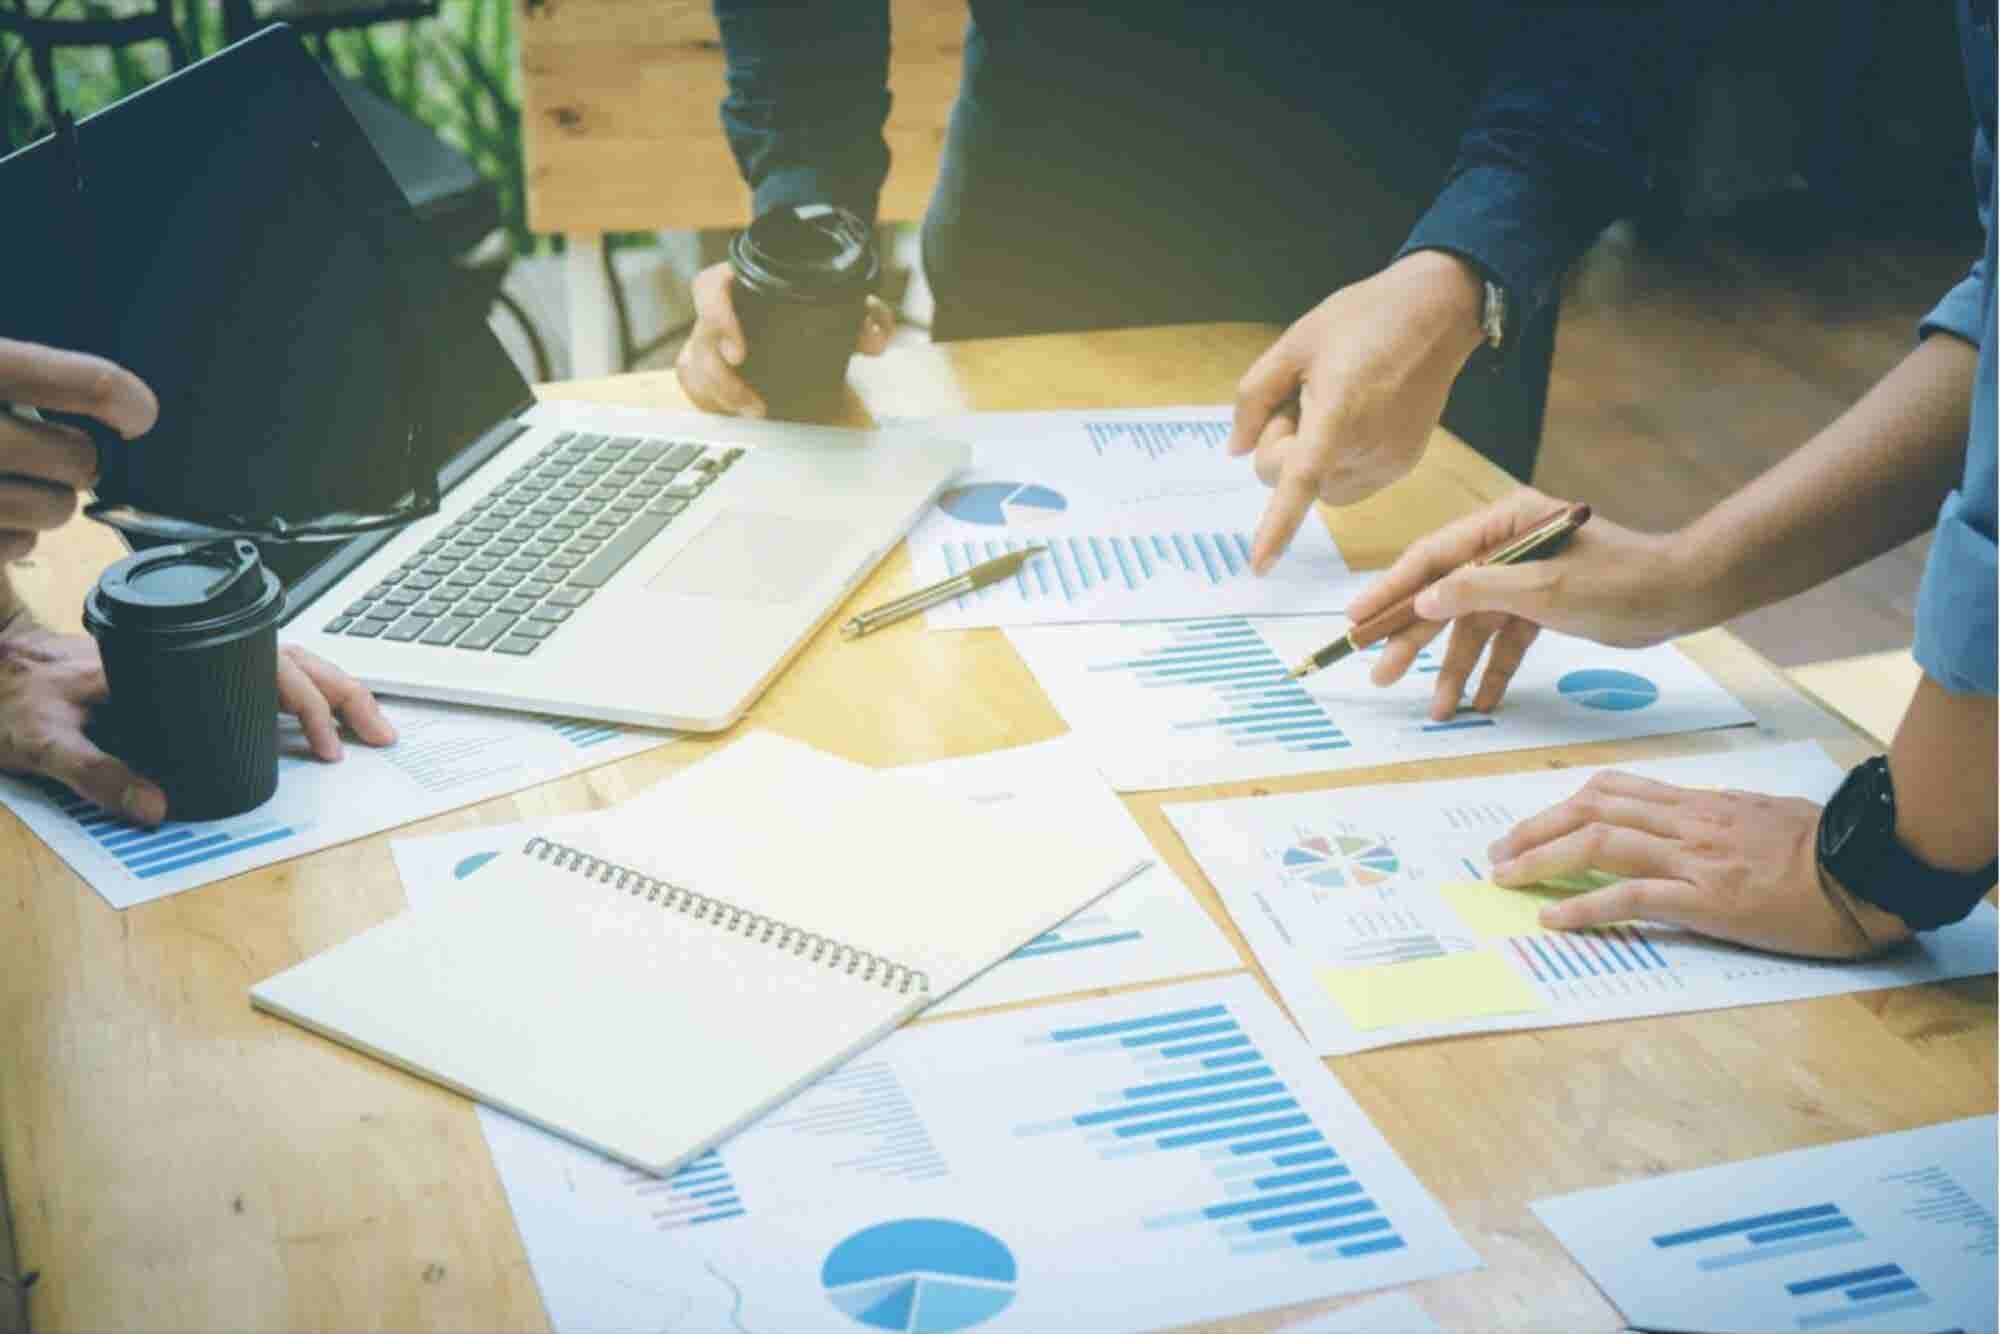 What Metrics Makes a Successful Incubator?